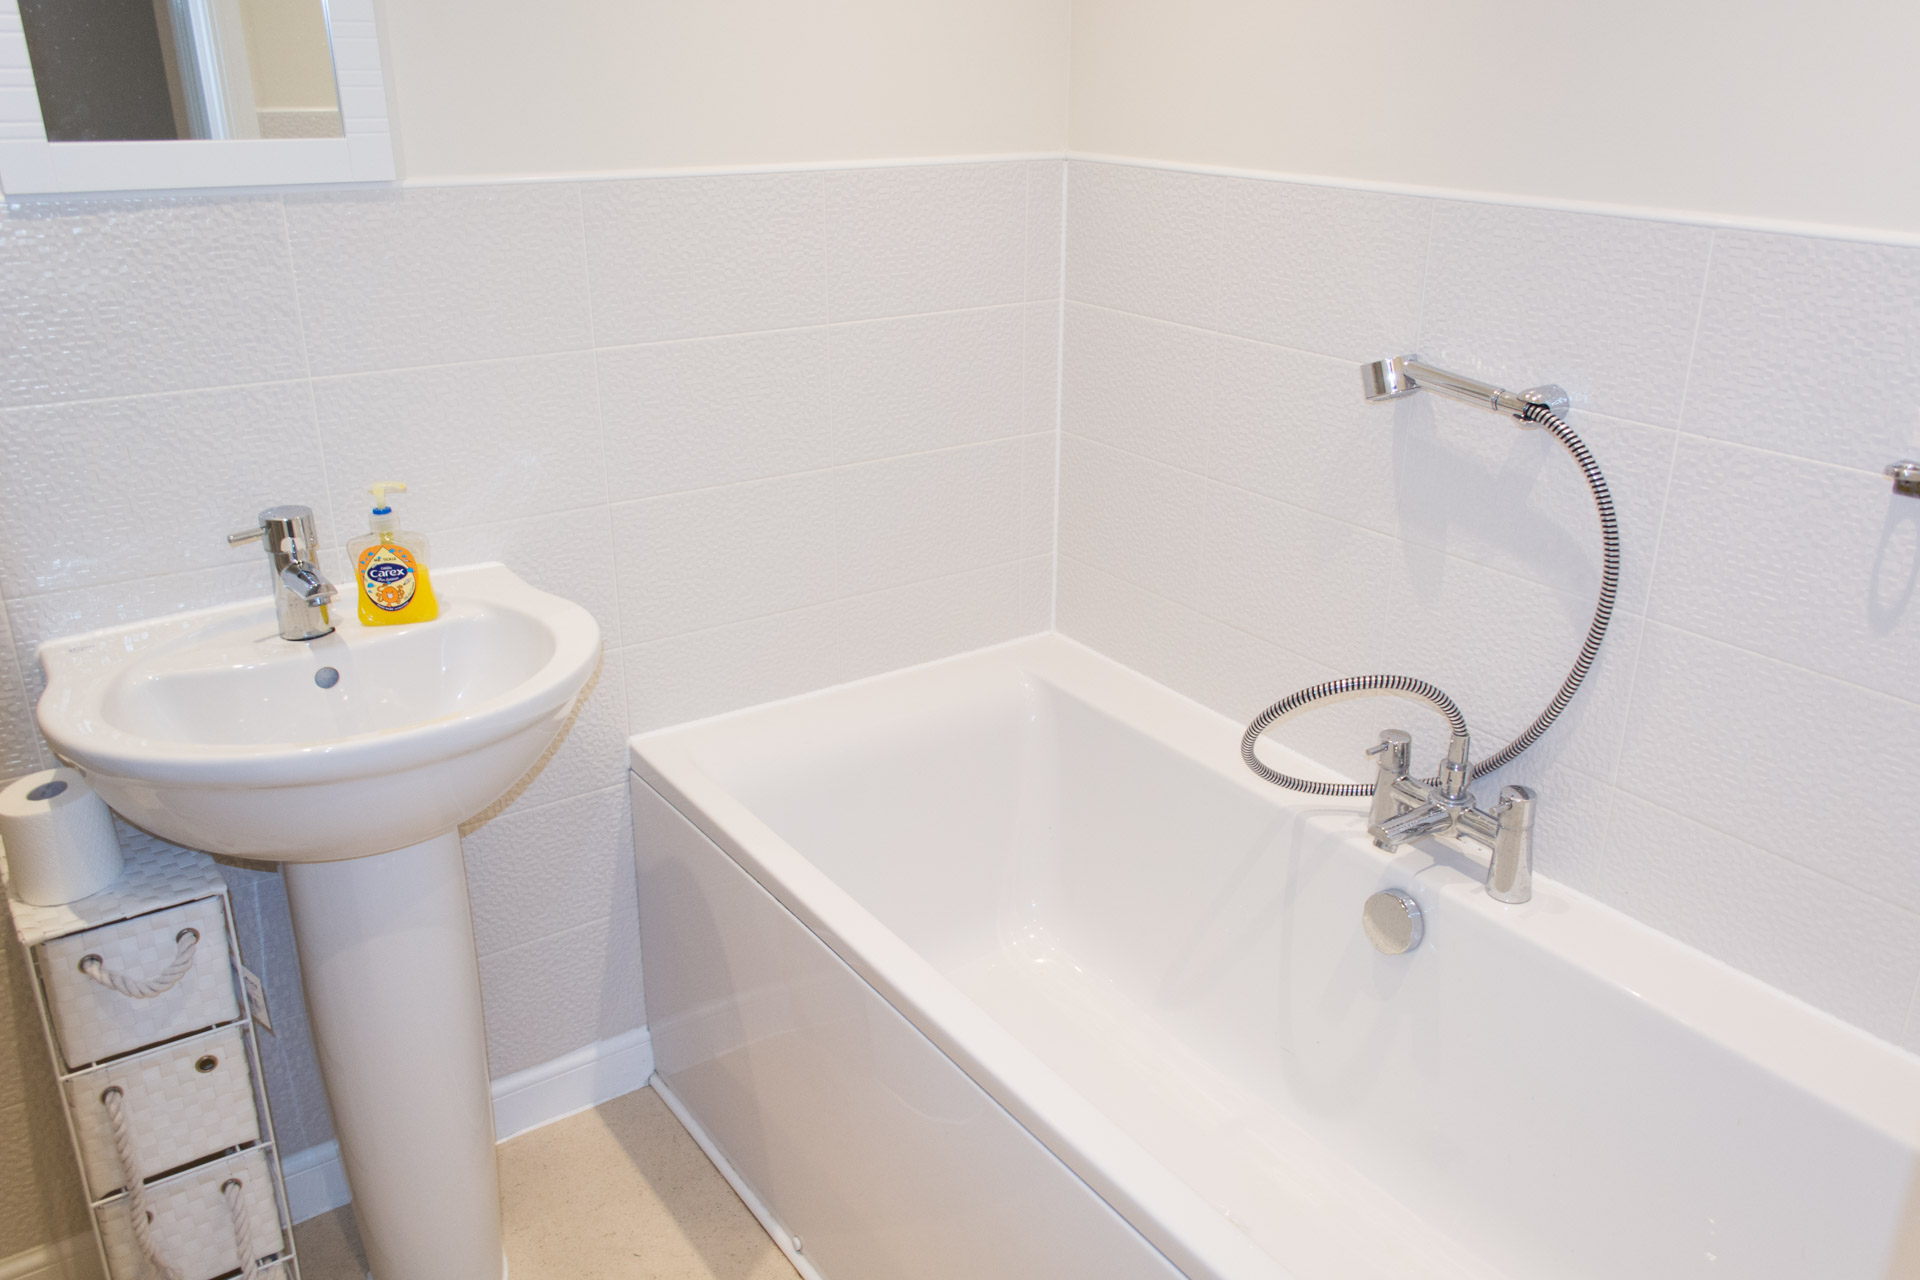 Family bathroom with bath tub and sink.